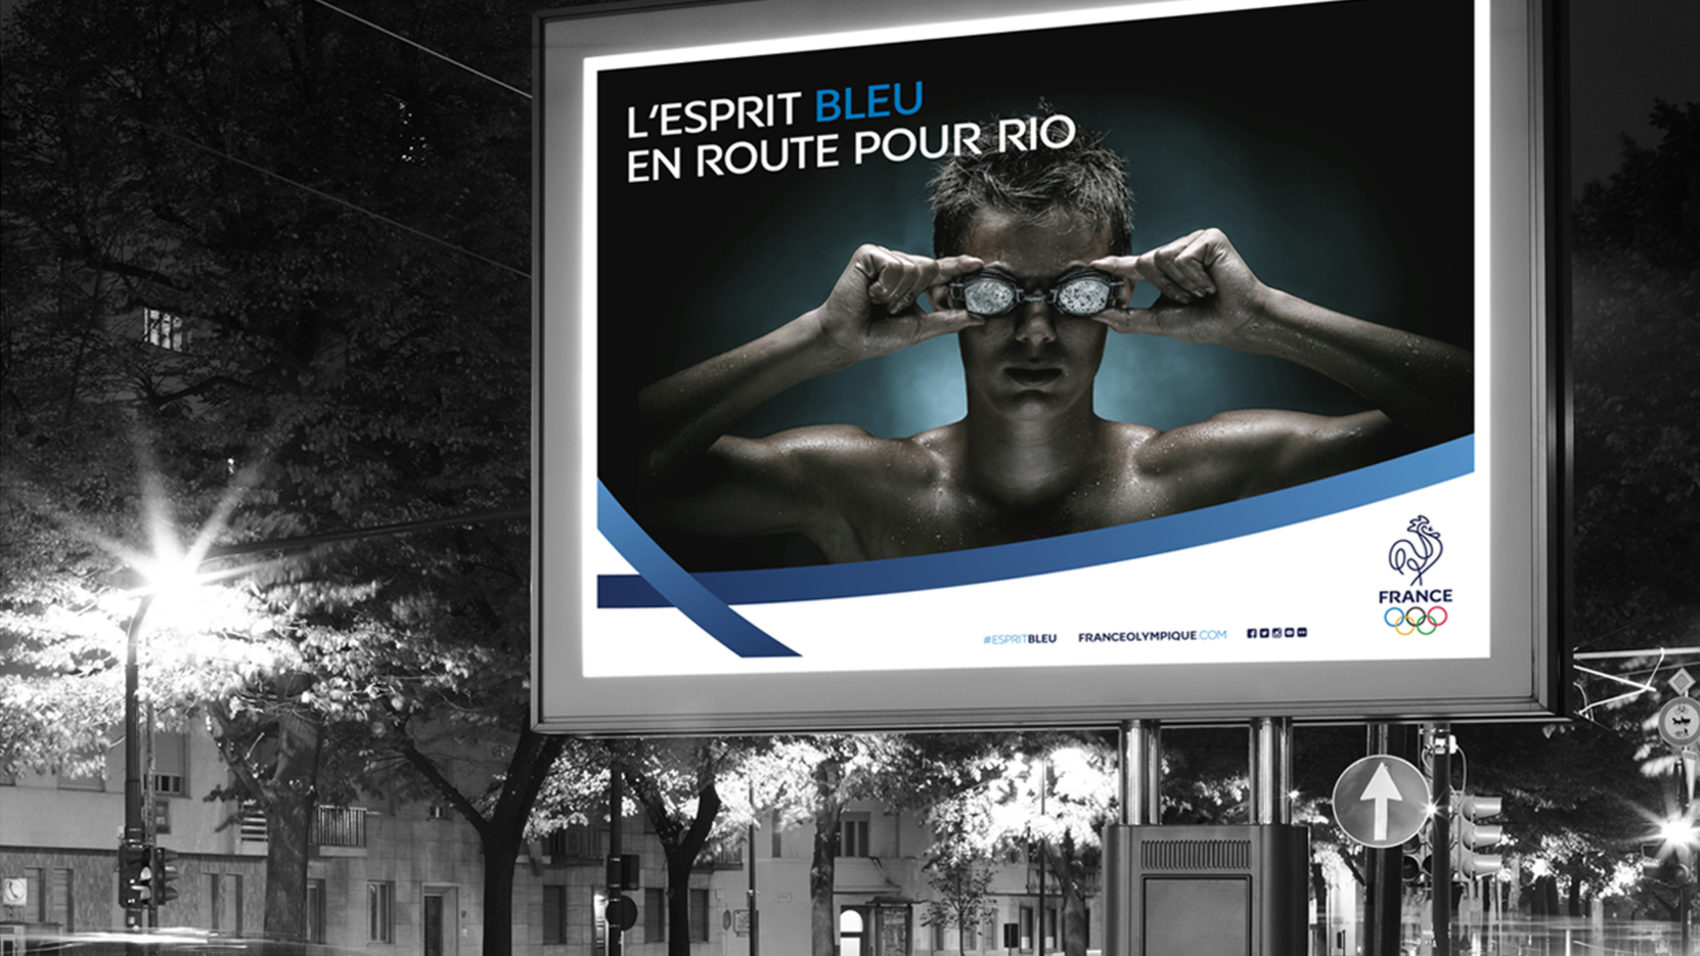 Projet_project_realisation_CNOSF_comite_national_olympique_et_sportif_francais_6